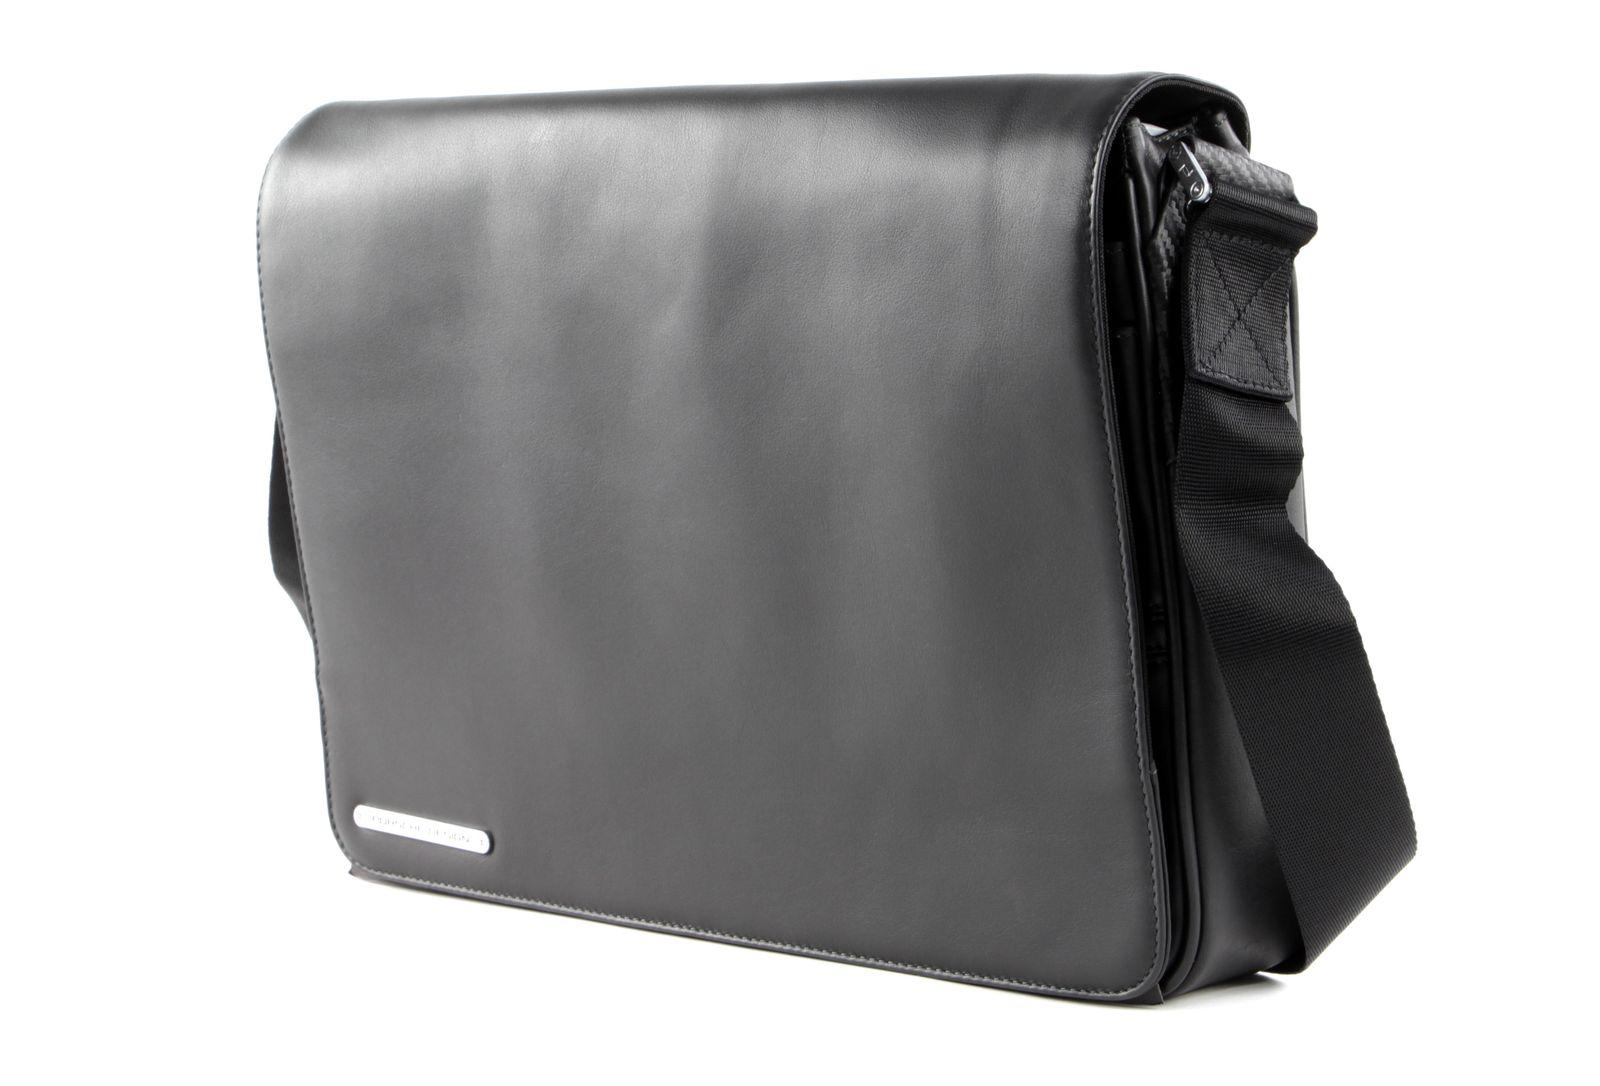 PORSCHE DESIGN CL2 2.0 Shoulder Bag M FH Black